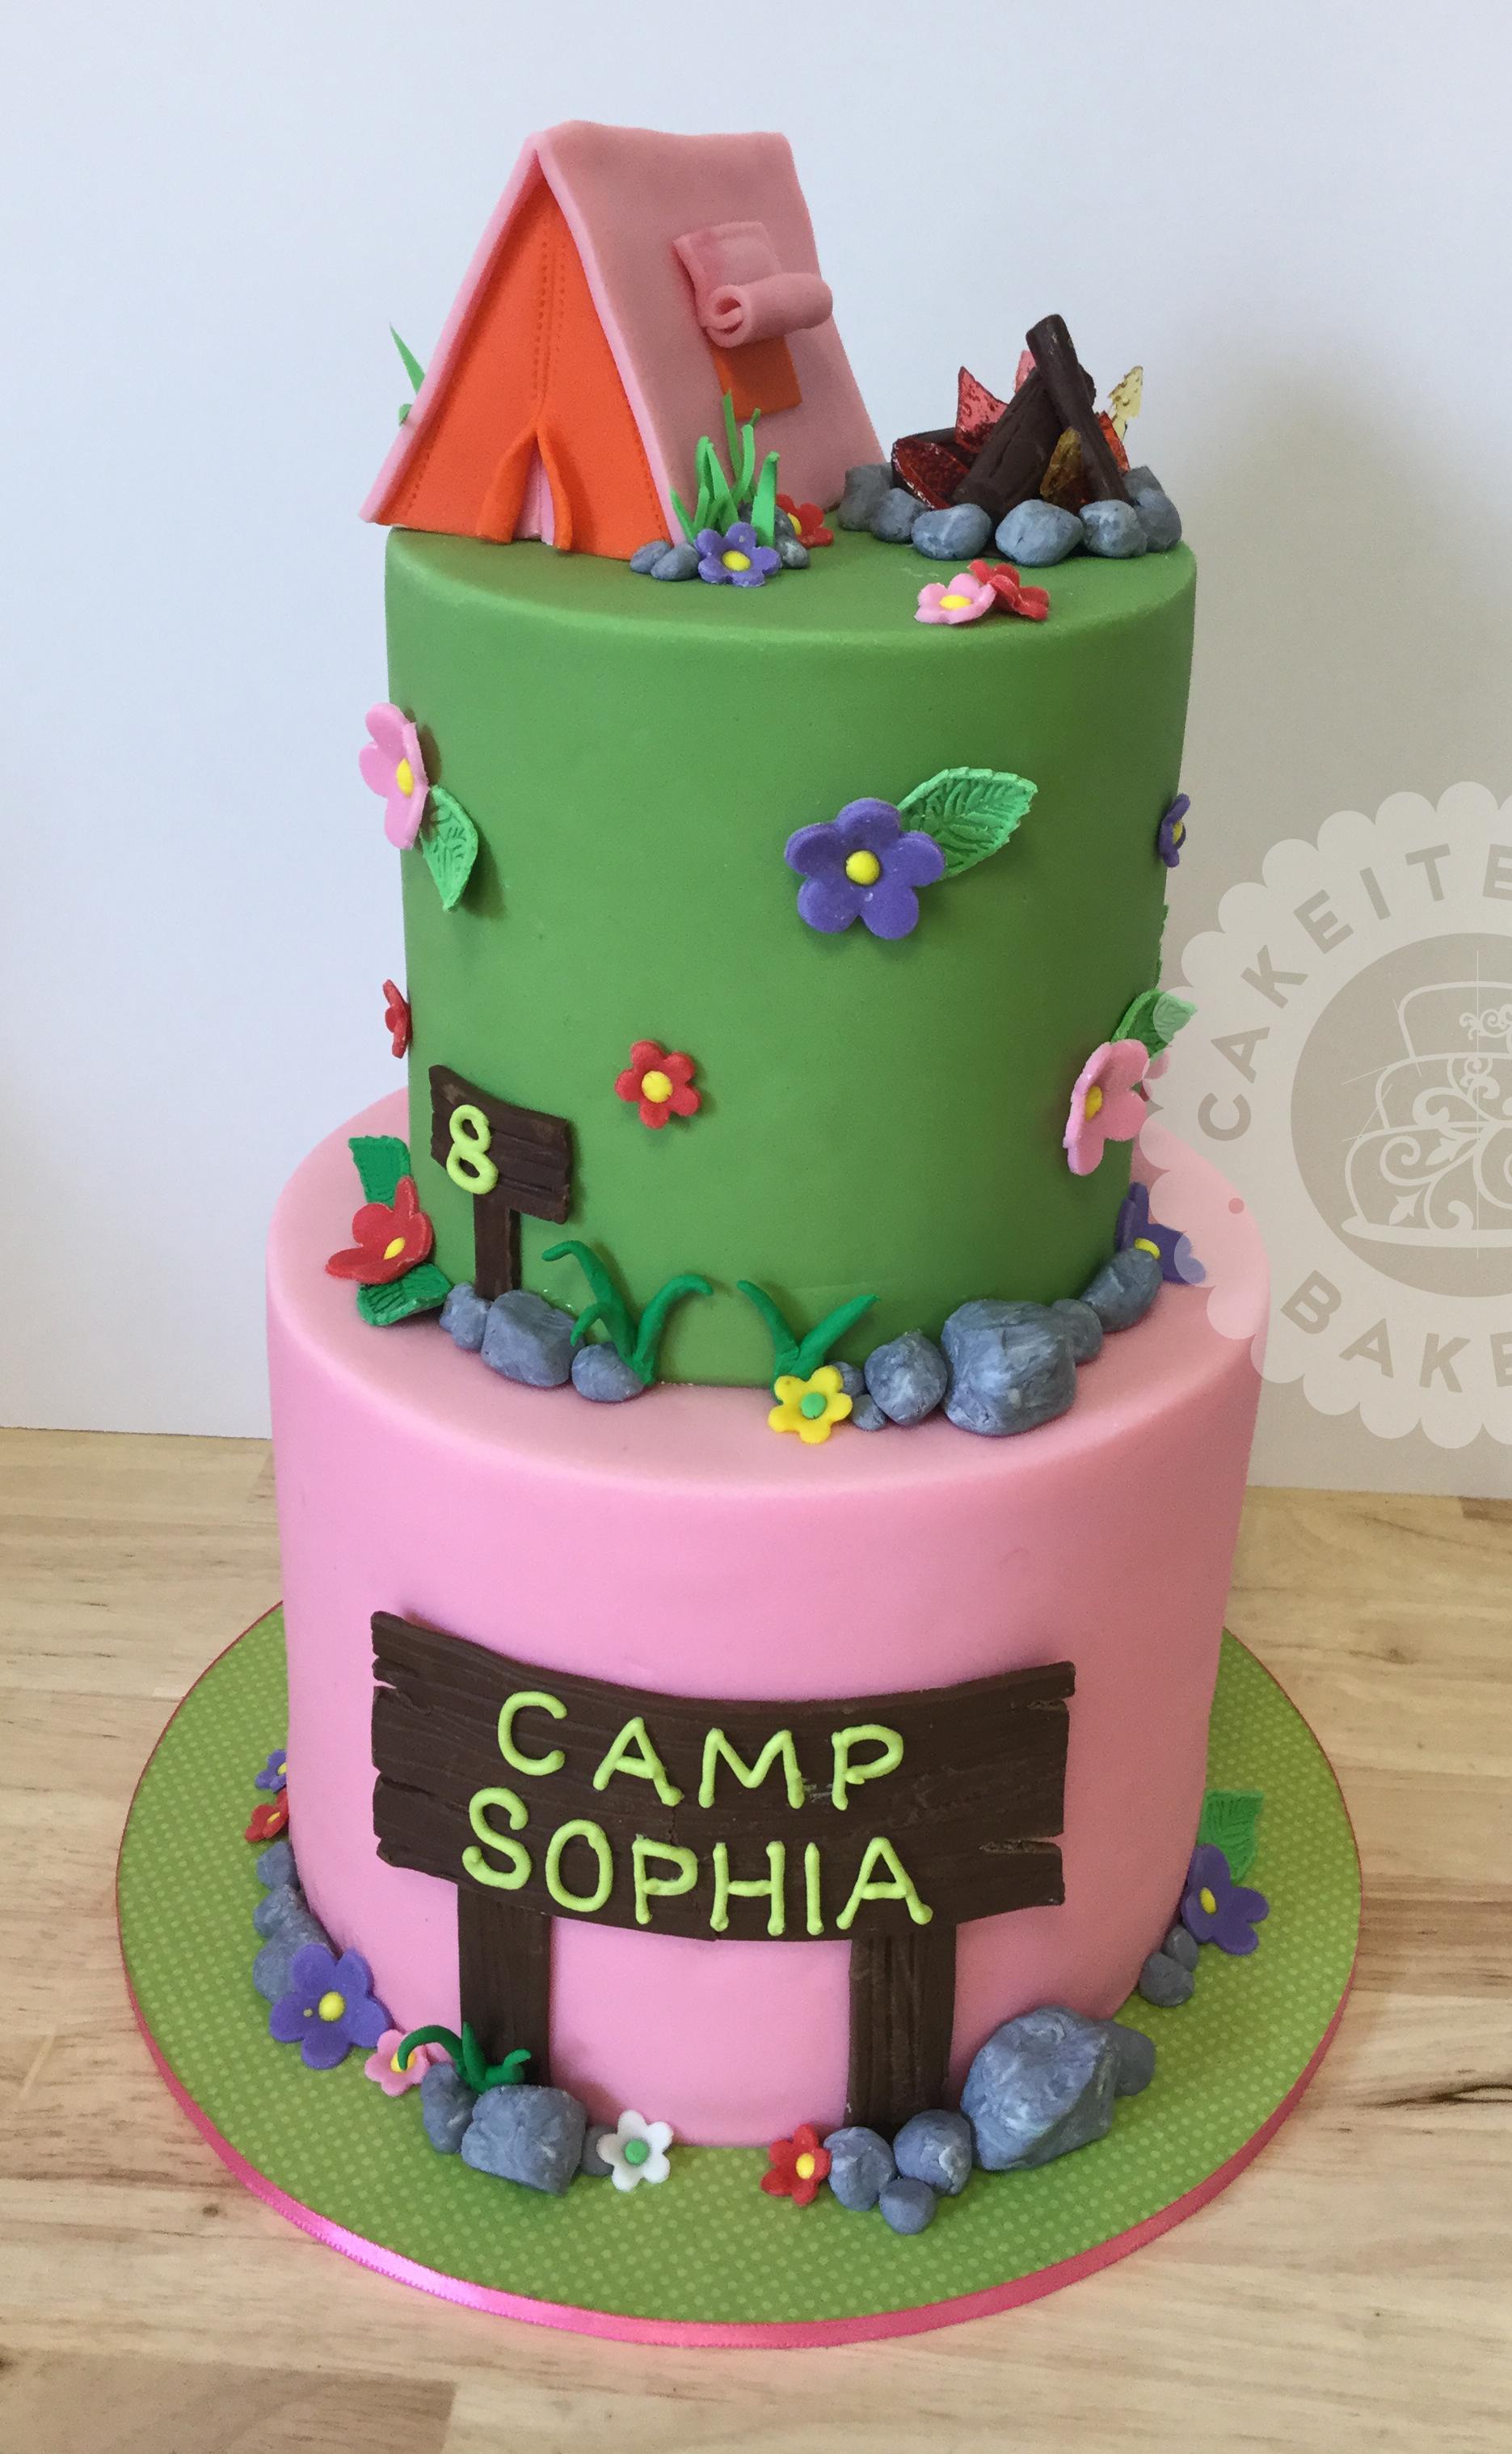 Cakeitecture Bakery 1716 campfire cake.jpg